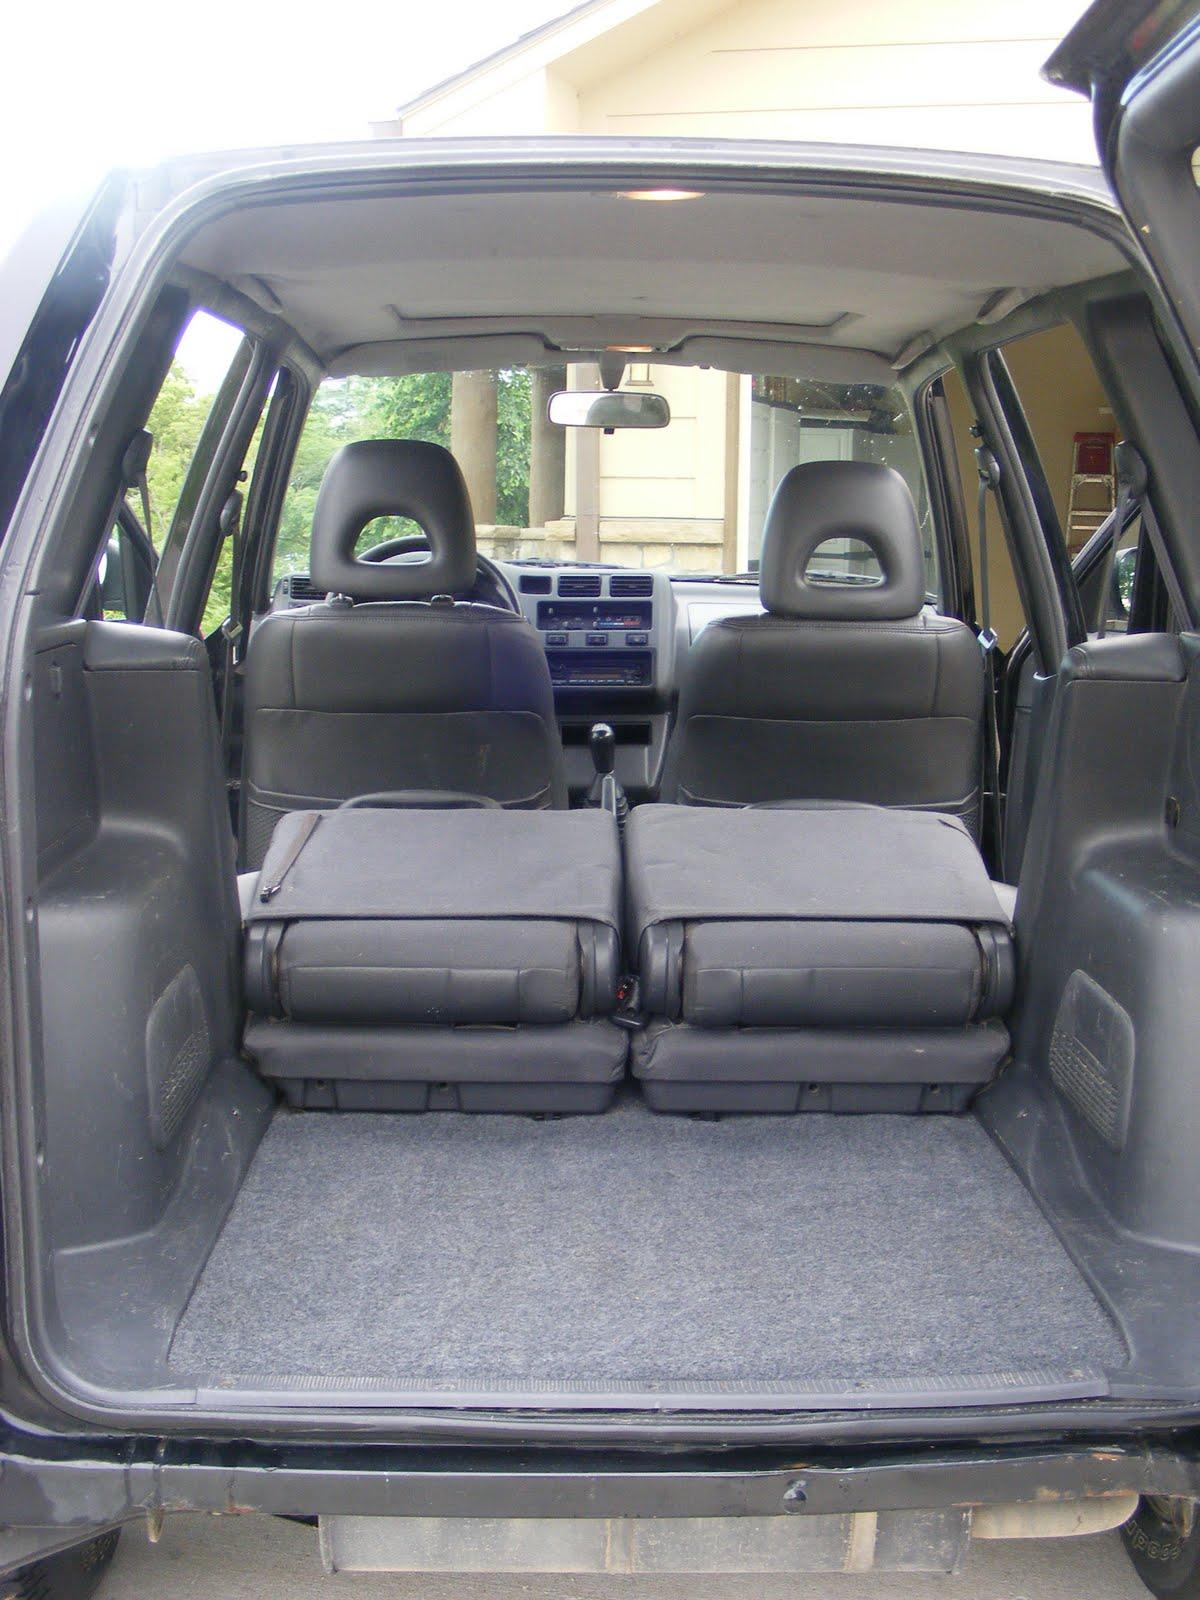 Bud Clary Toyota Yakima | Upcomingcarshq.com